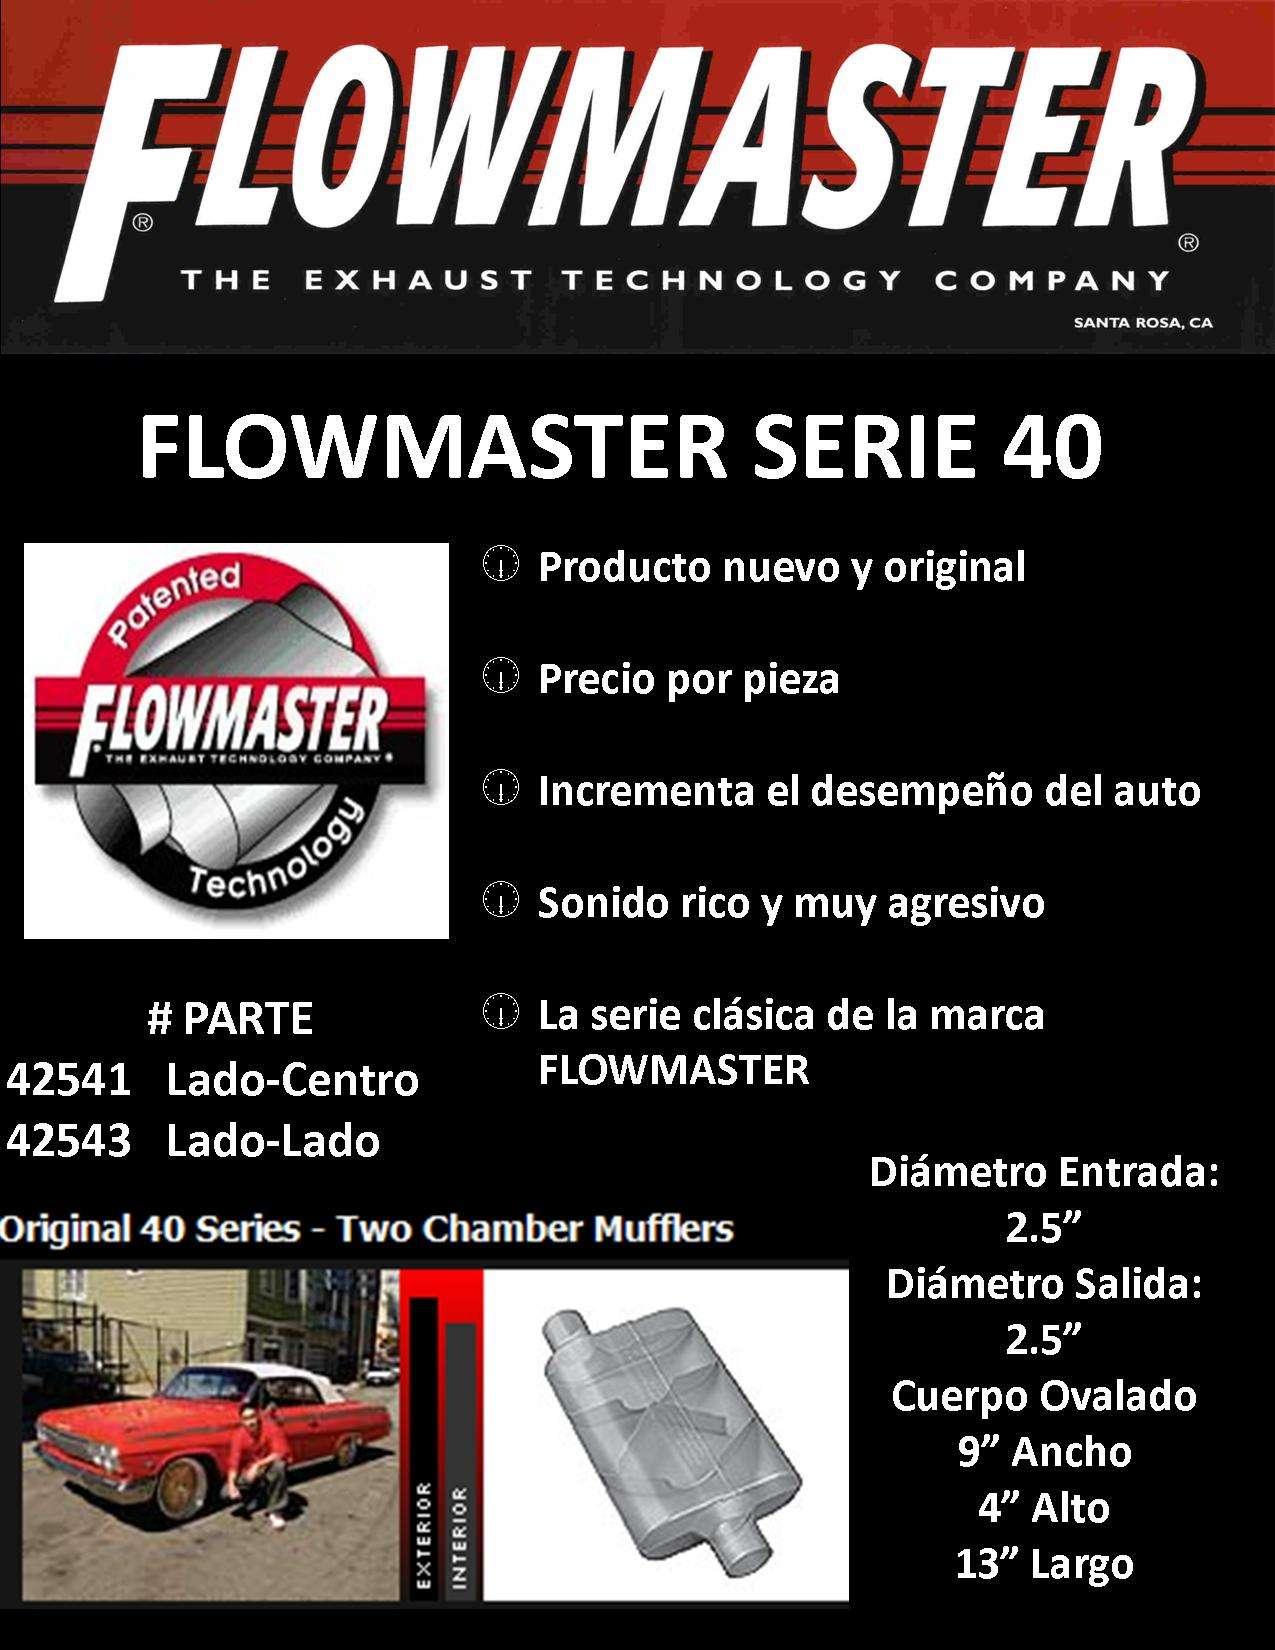 flowmaster serie 40 escape mofle muffler exhaust